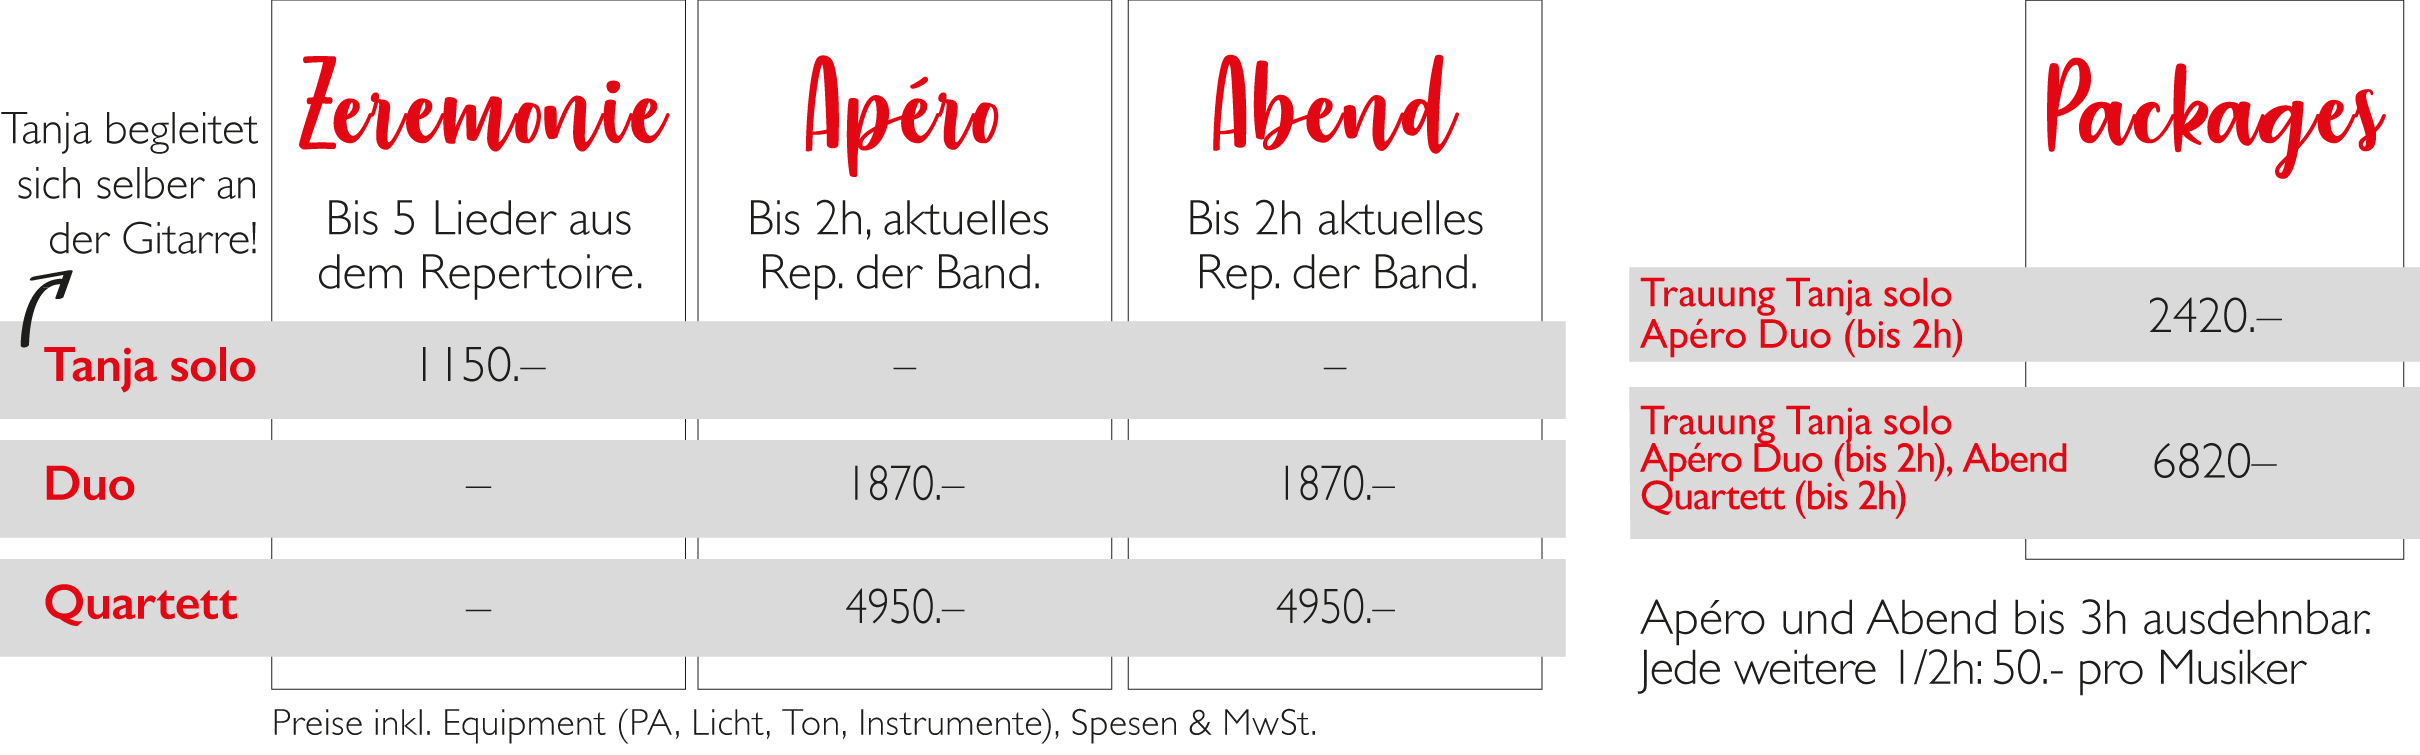 band-preistabelle-2020-polly